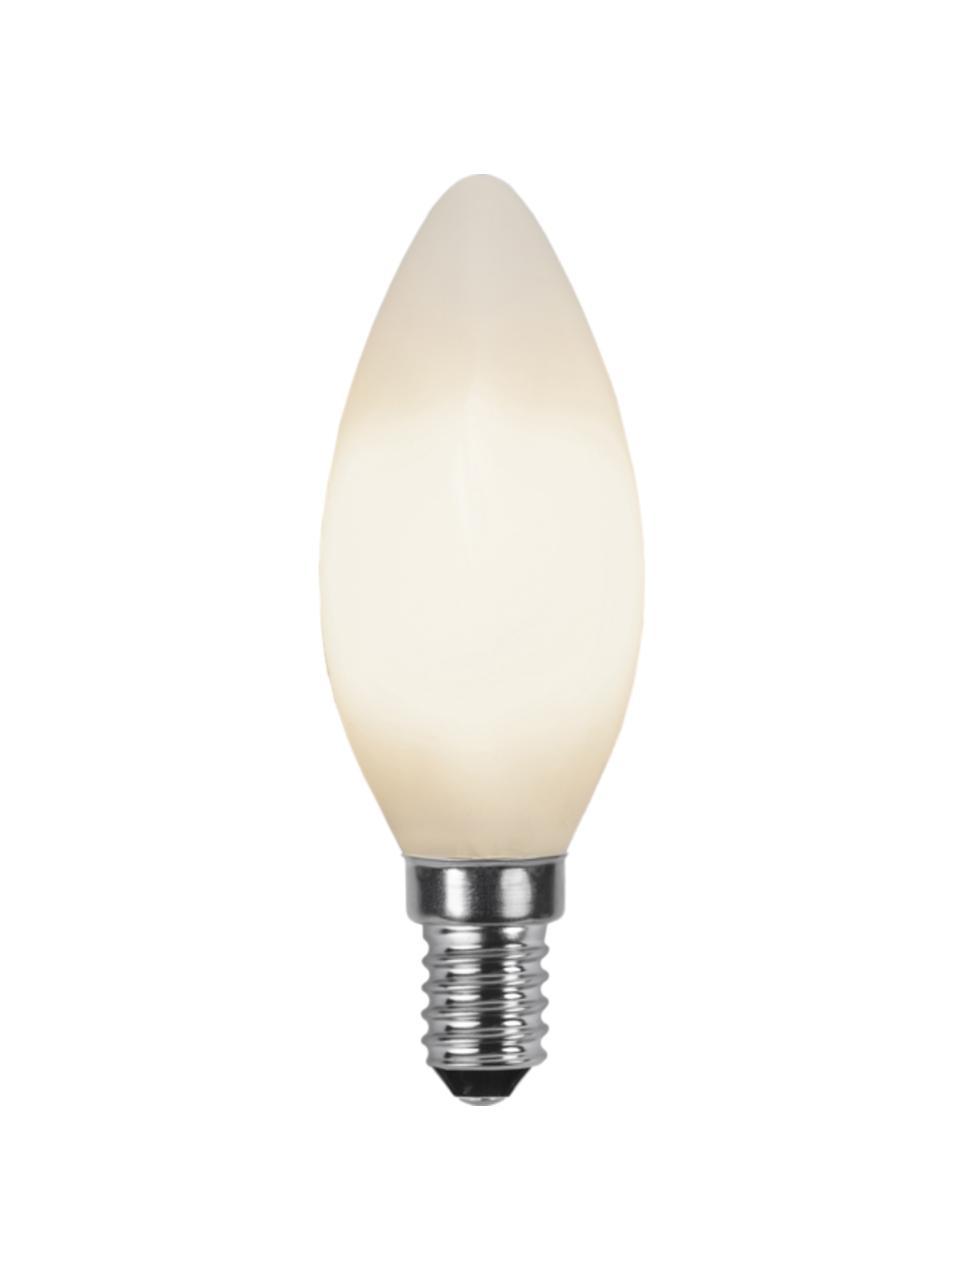 Lampadina E14, 2W, bianco caldo 2 pz, Lampadina: vetro, Bianco, Ø 4 x Alt. 10 cm